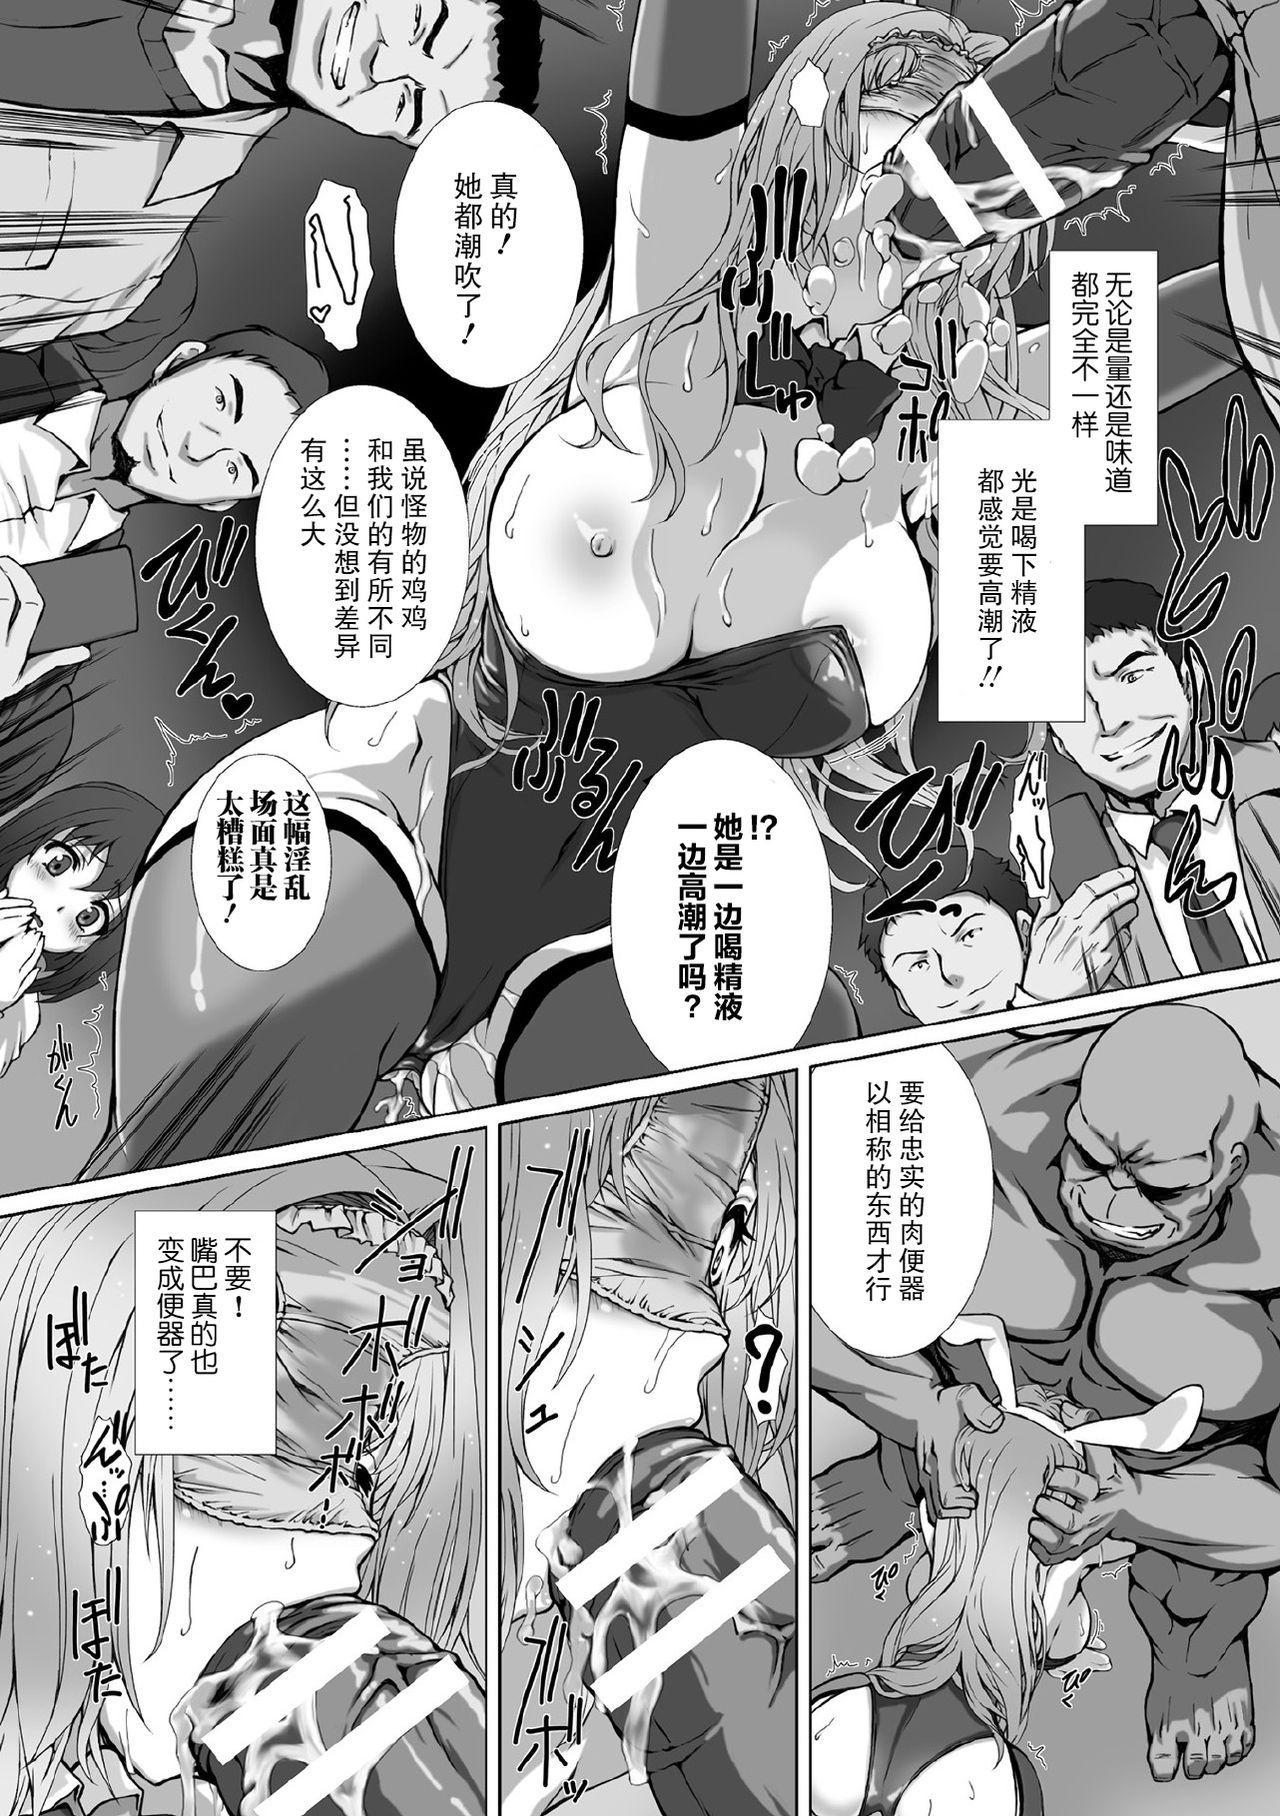 Hengen Souki Shine Mirage THE COMIC EPISODE 8 24